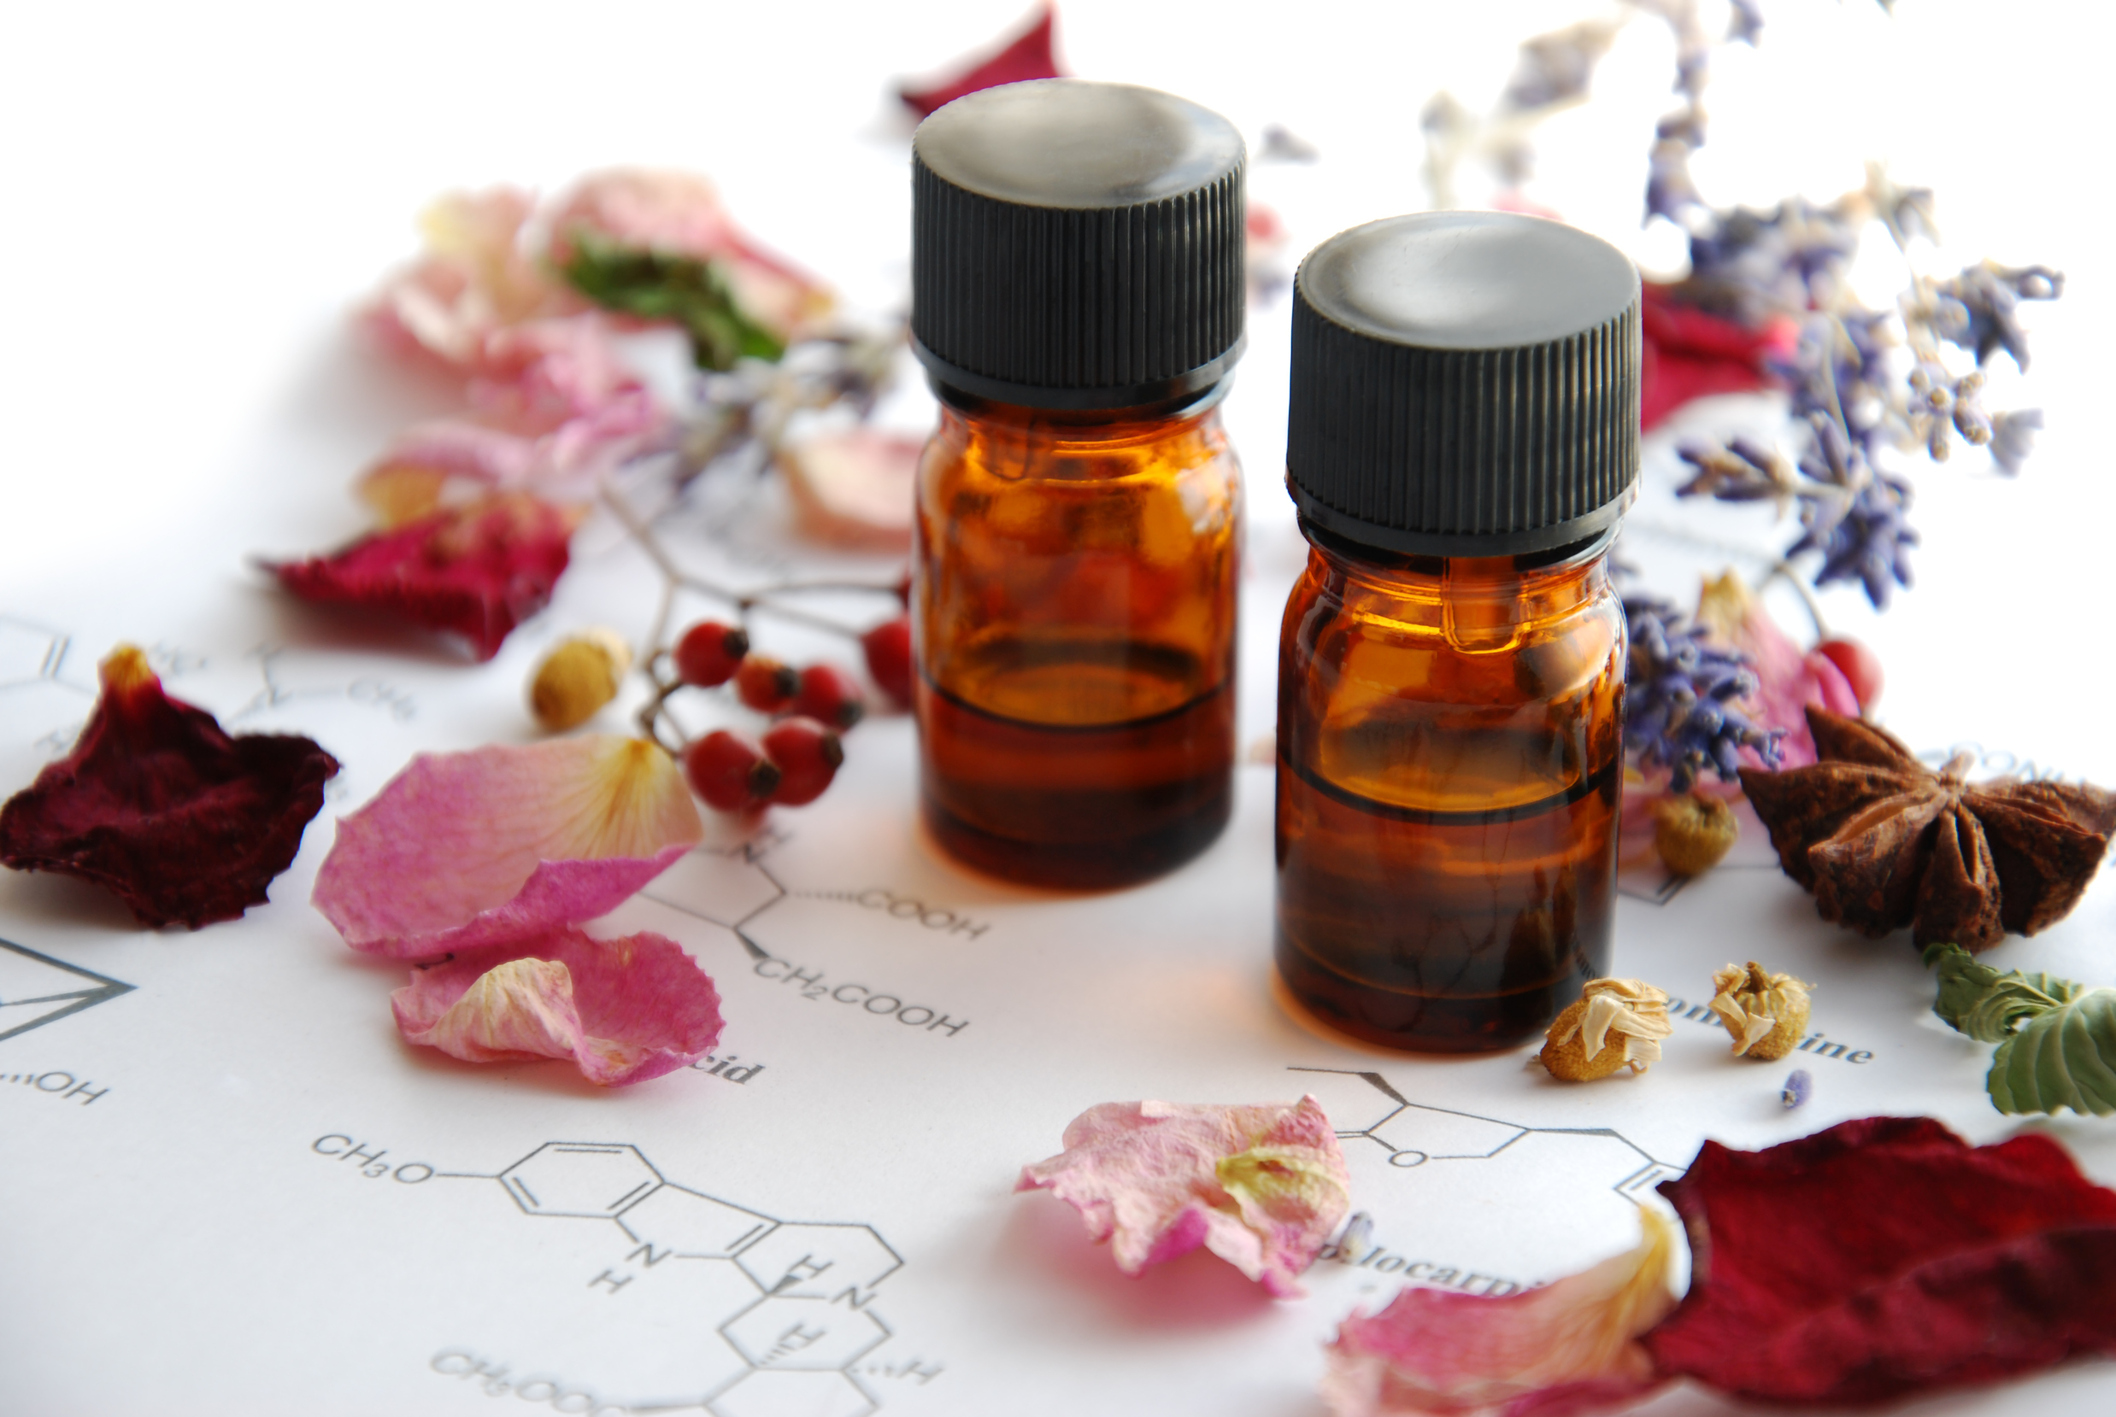 All natural skin moisturizers & skin oils.